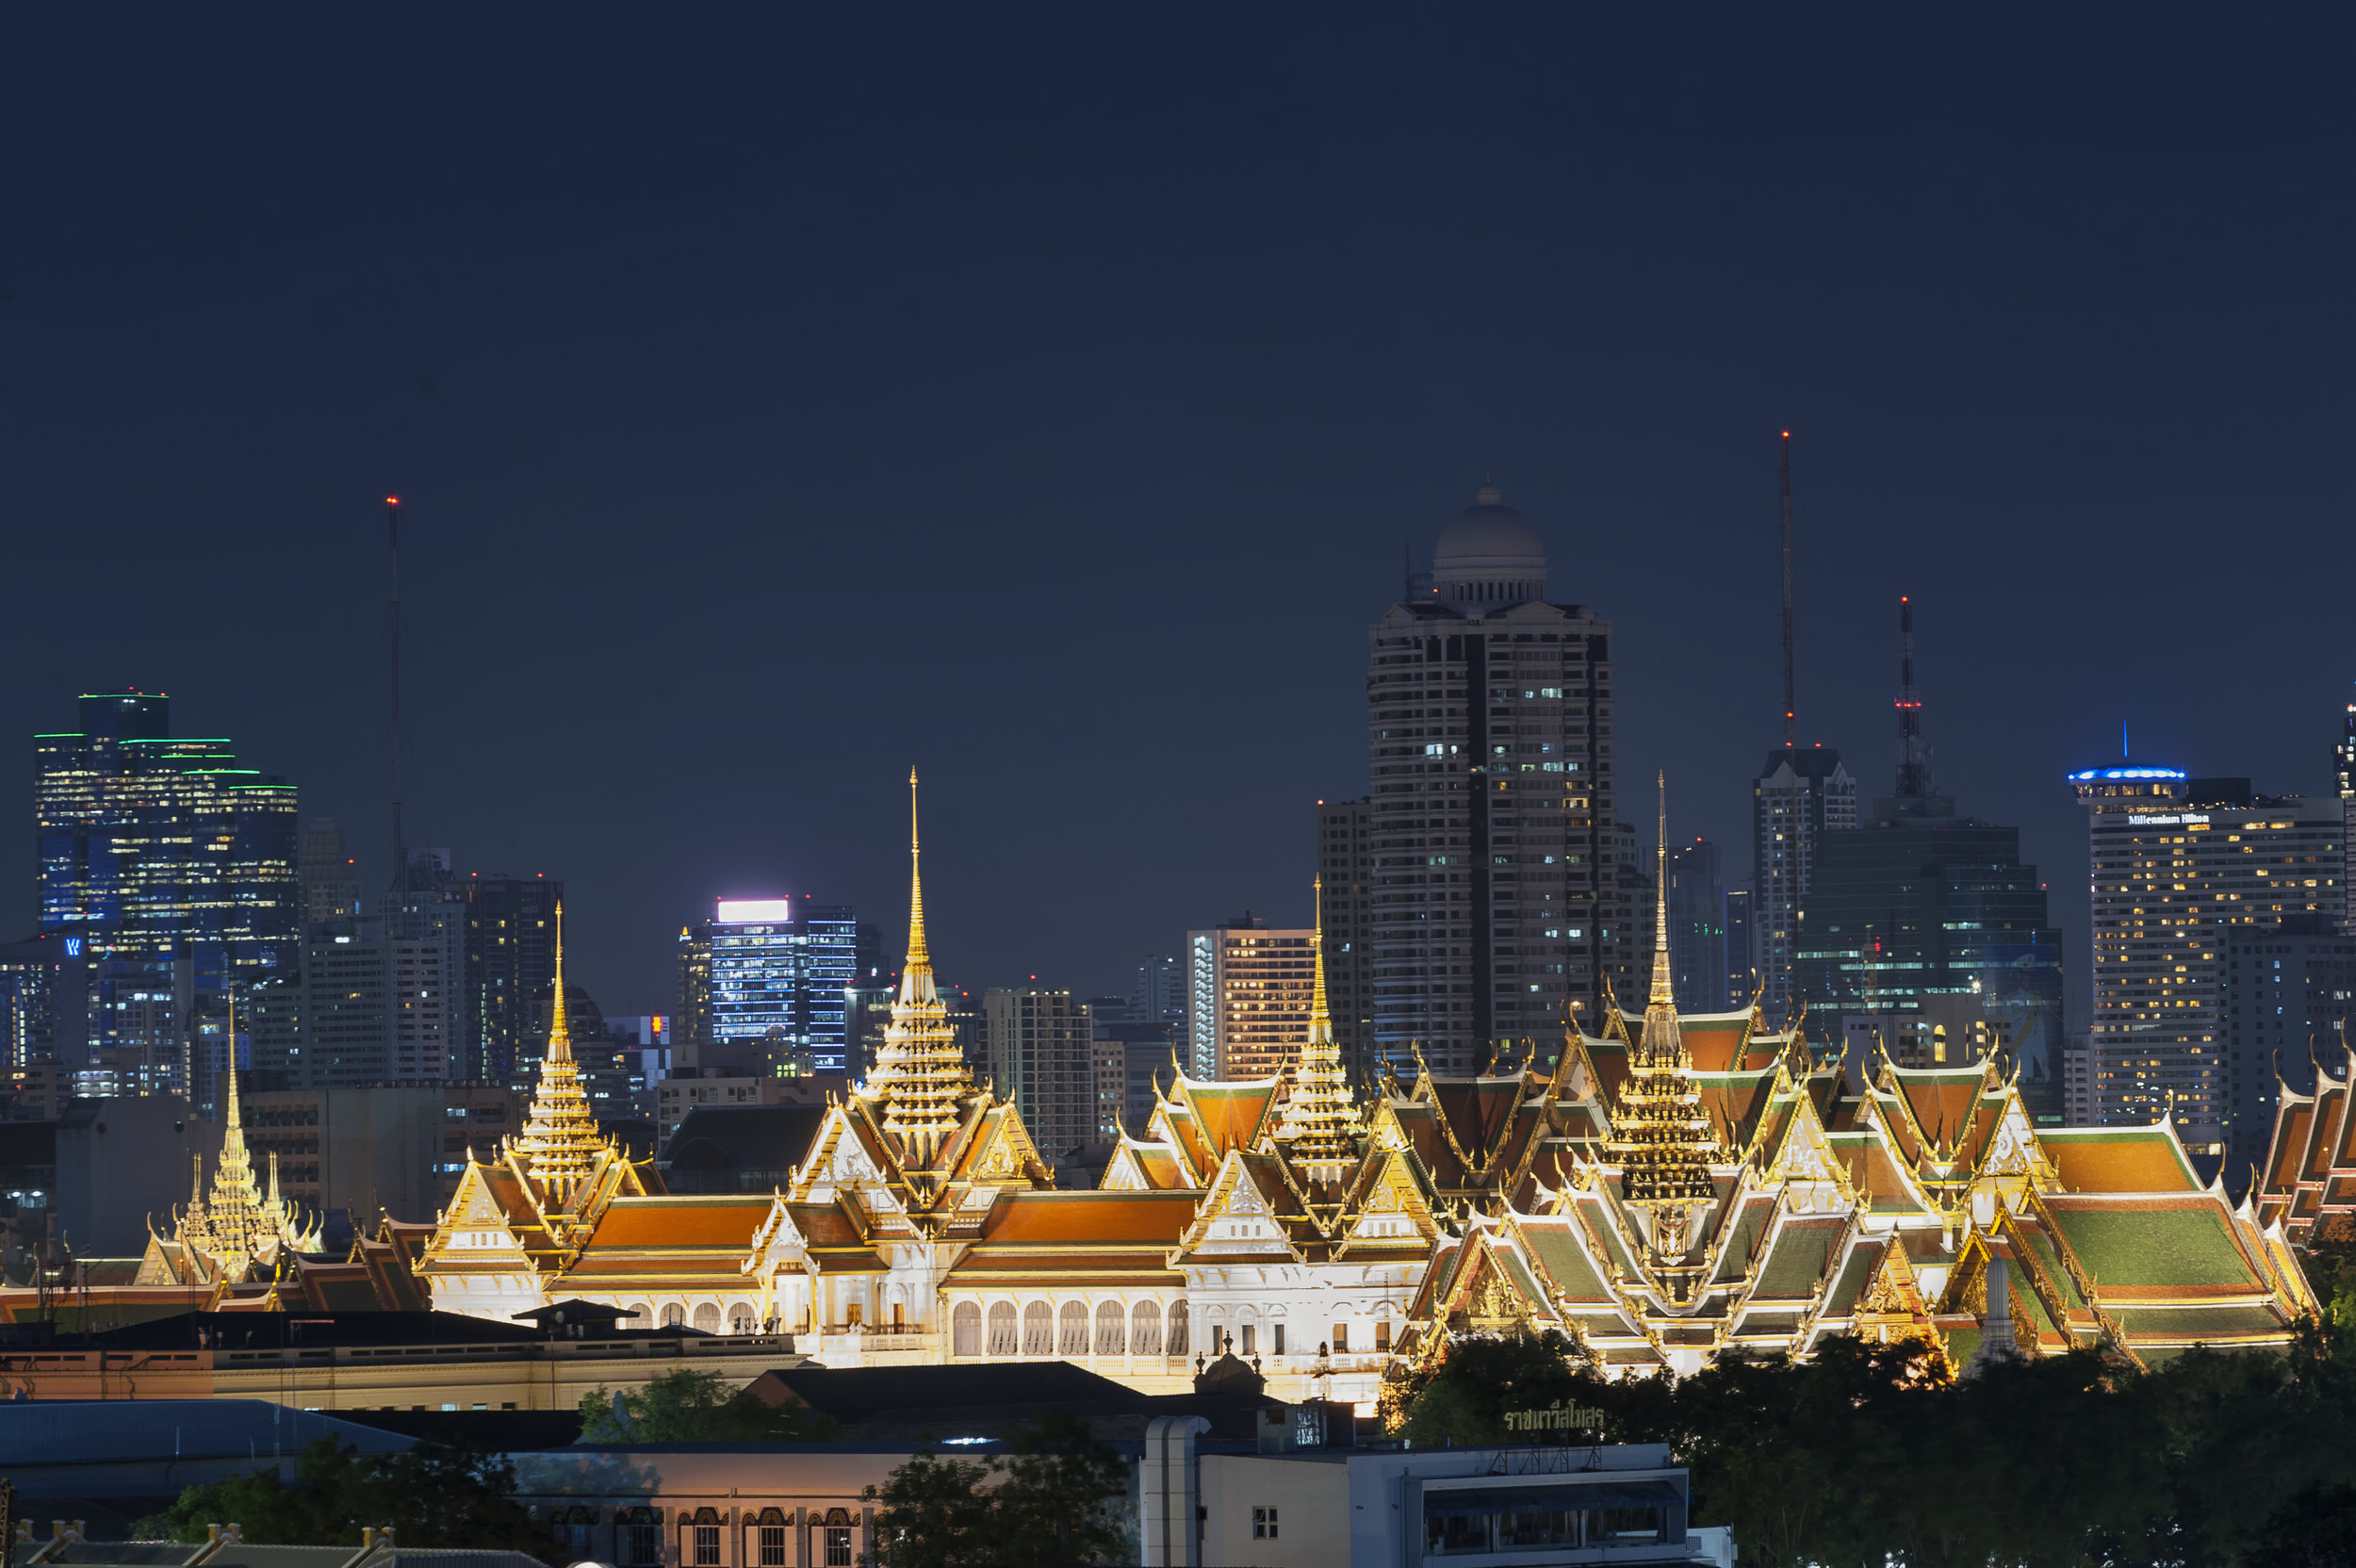 0005574_-_Wat_Phra_Kaew_002.jpg